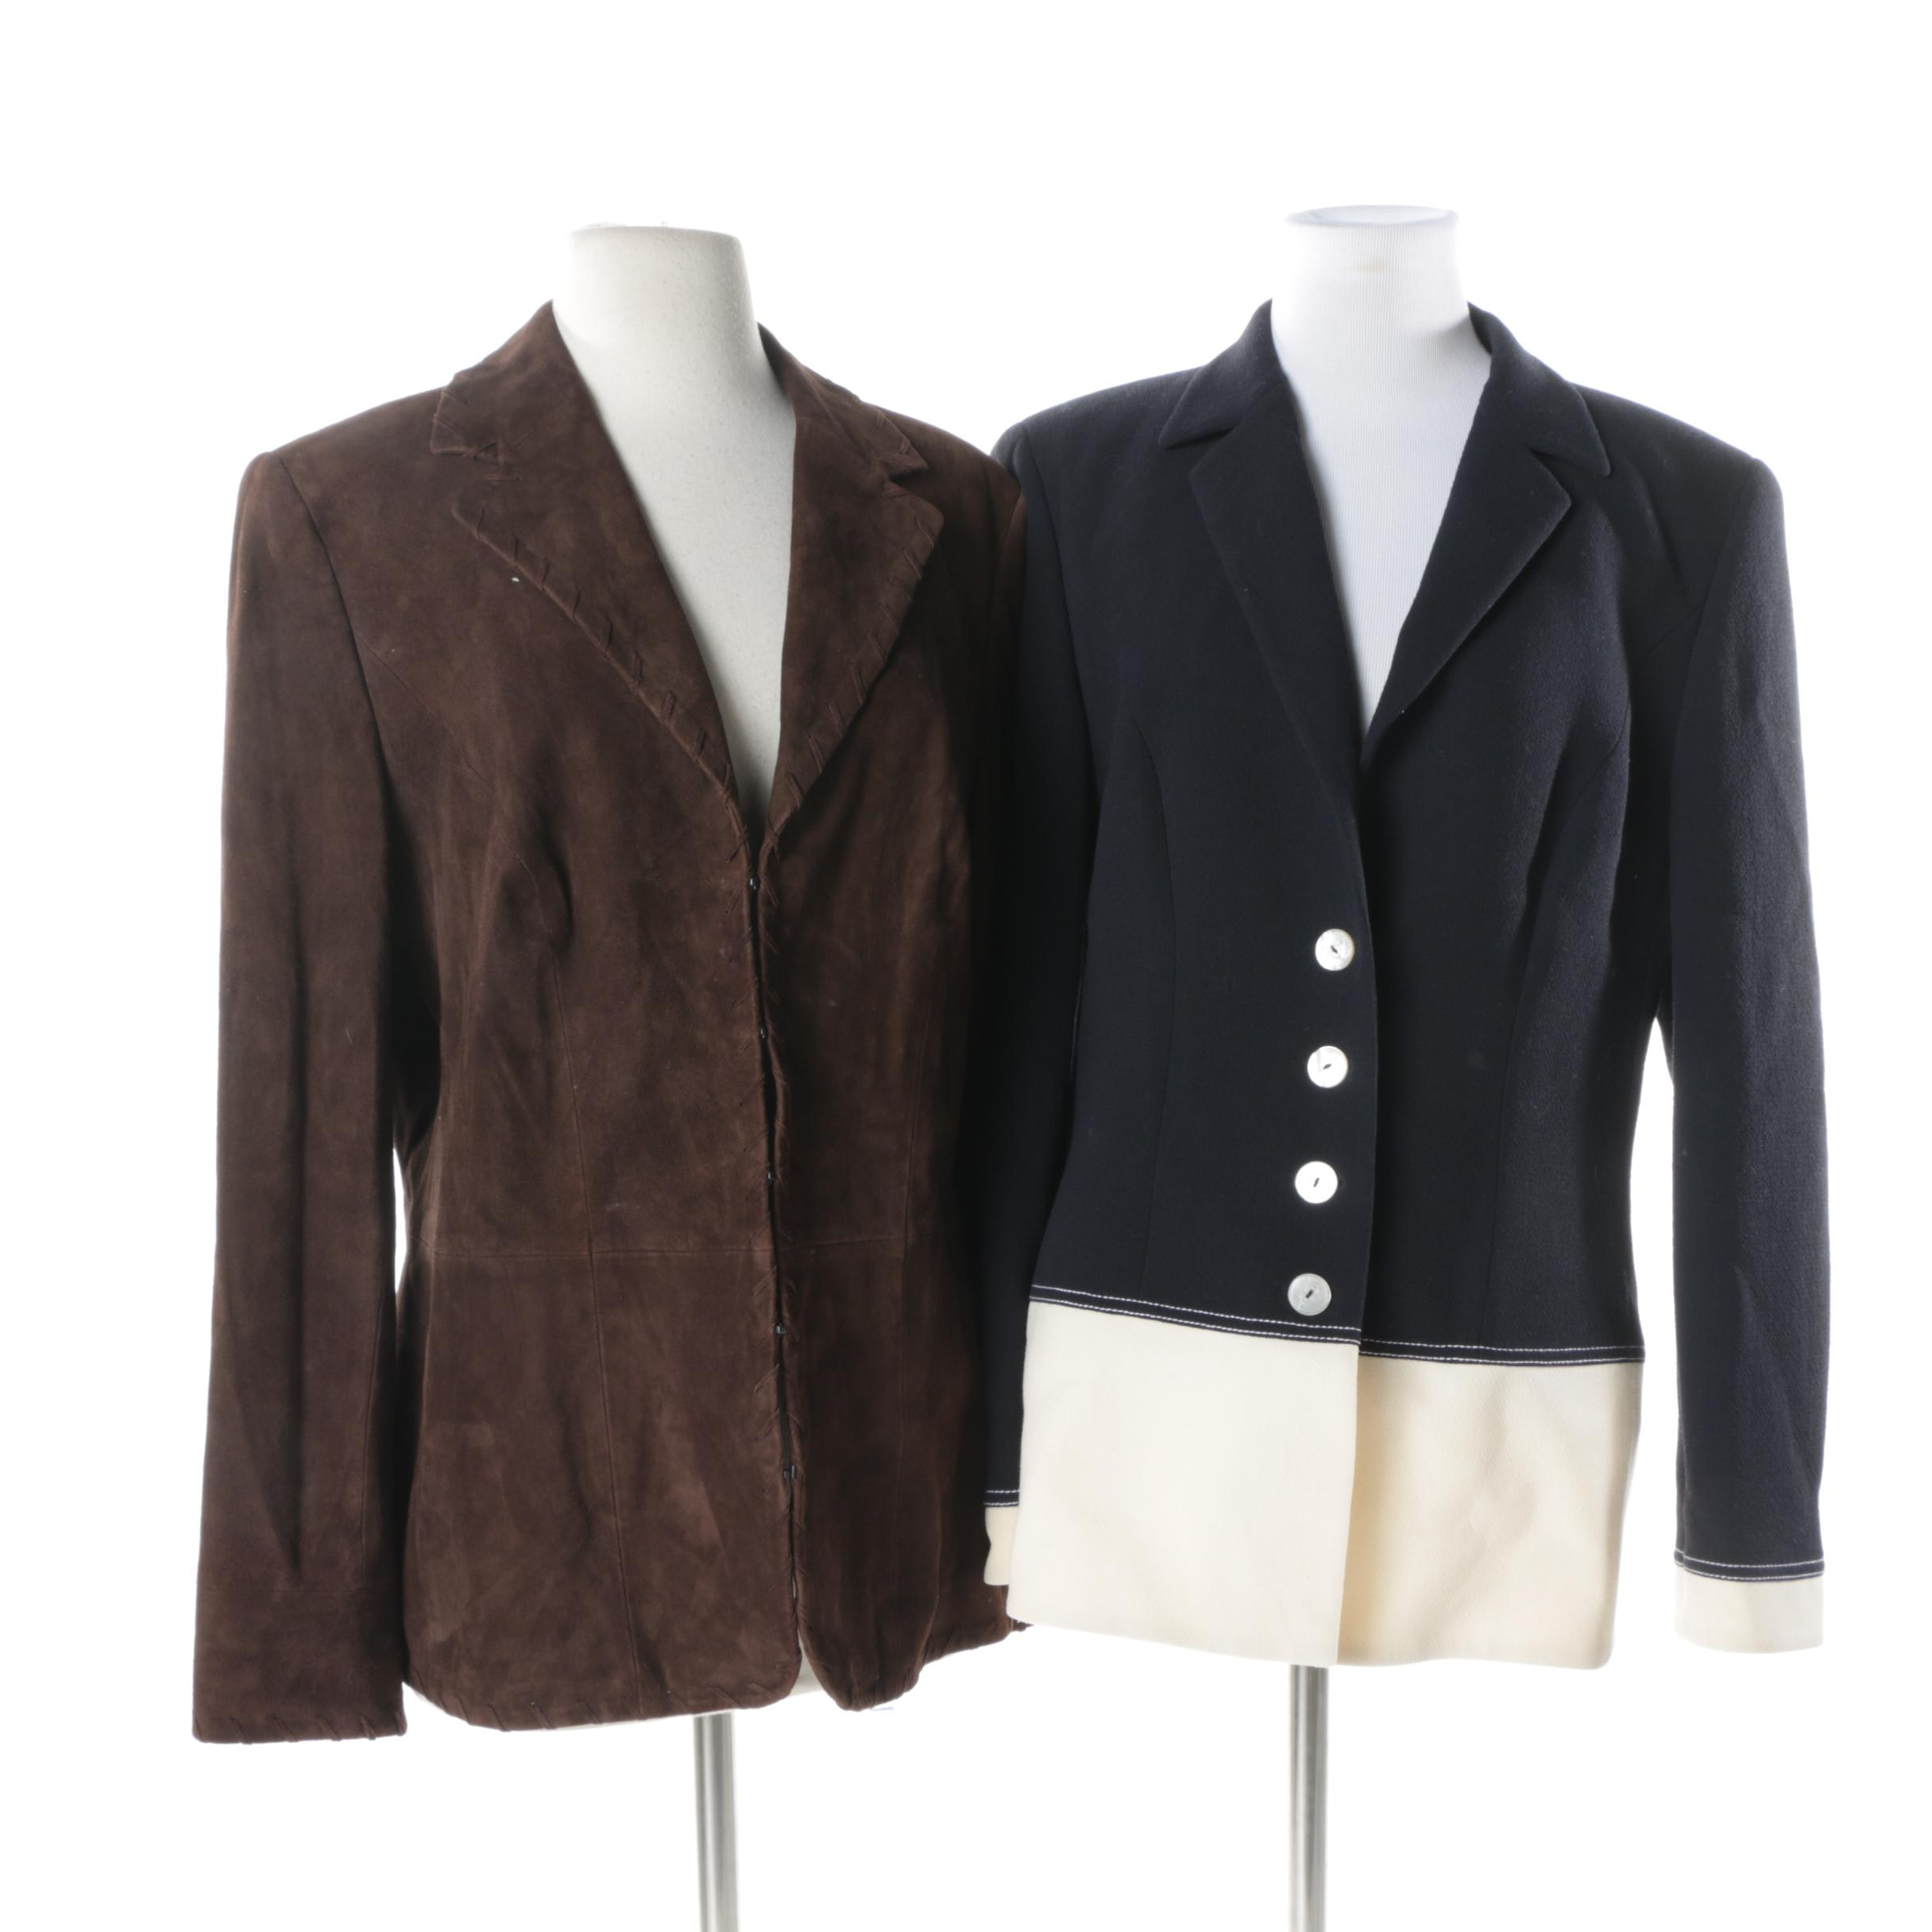 Women's Escada Suede and Suit Jackets